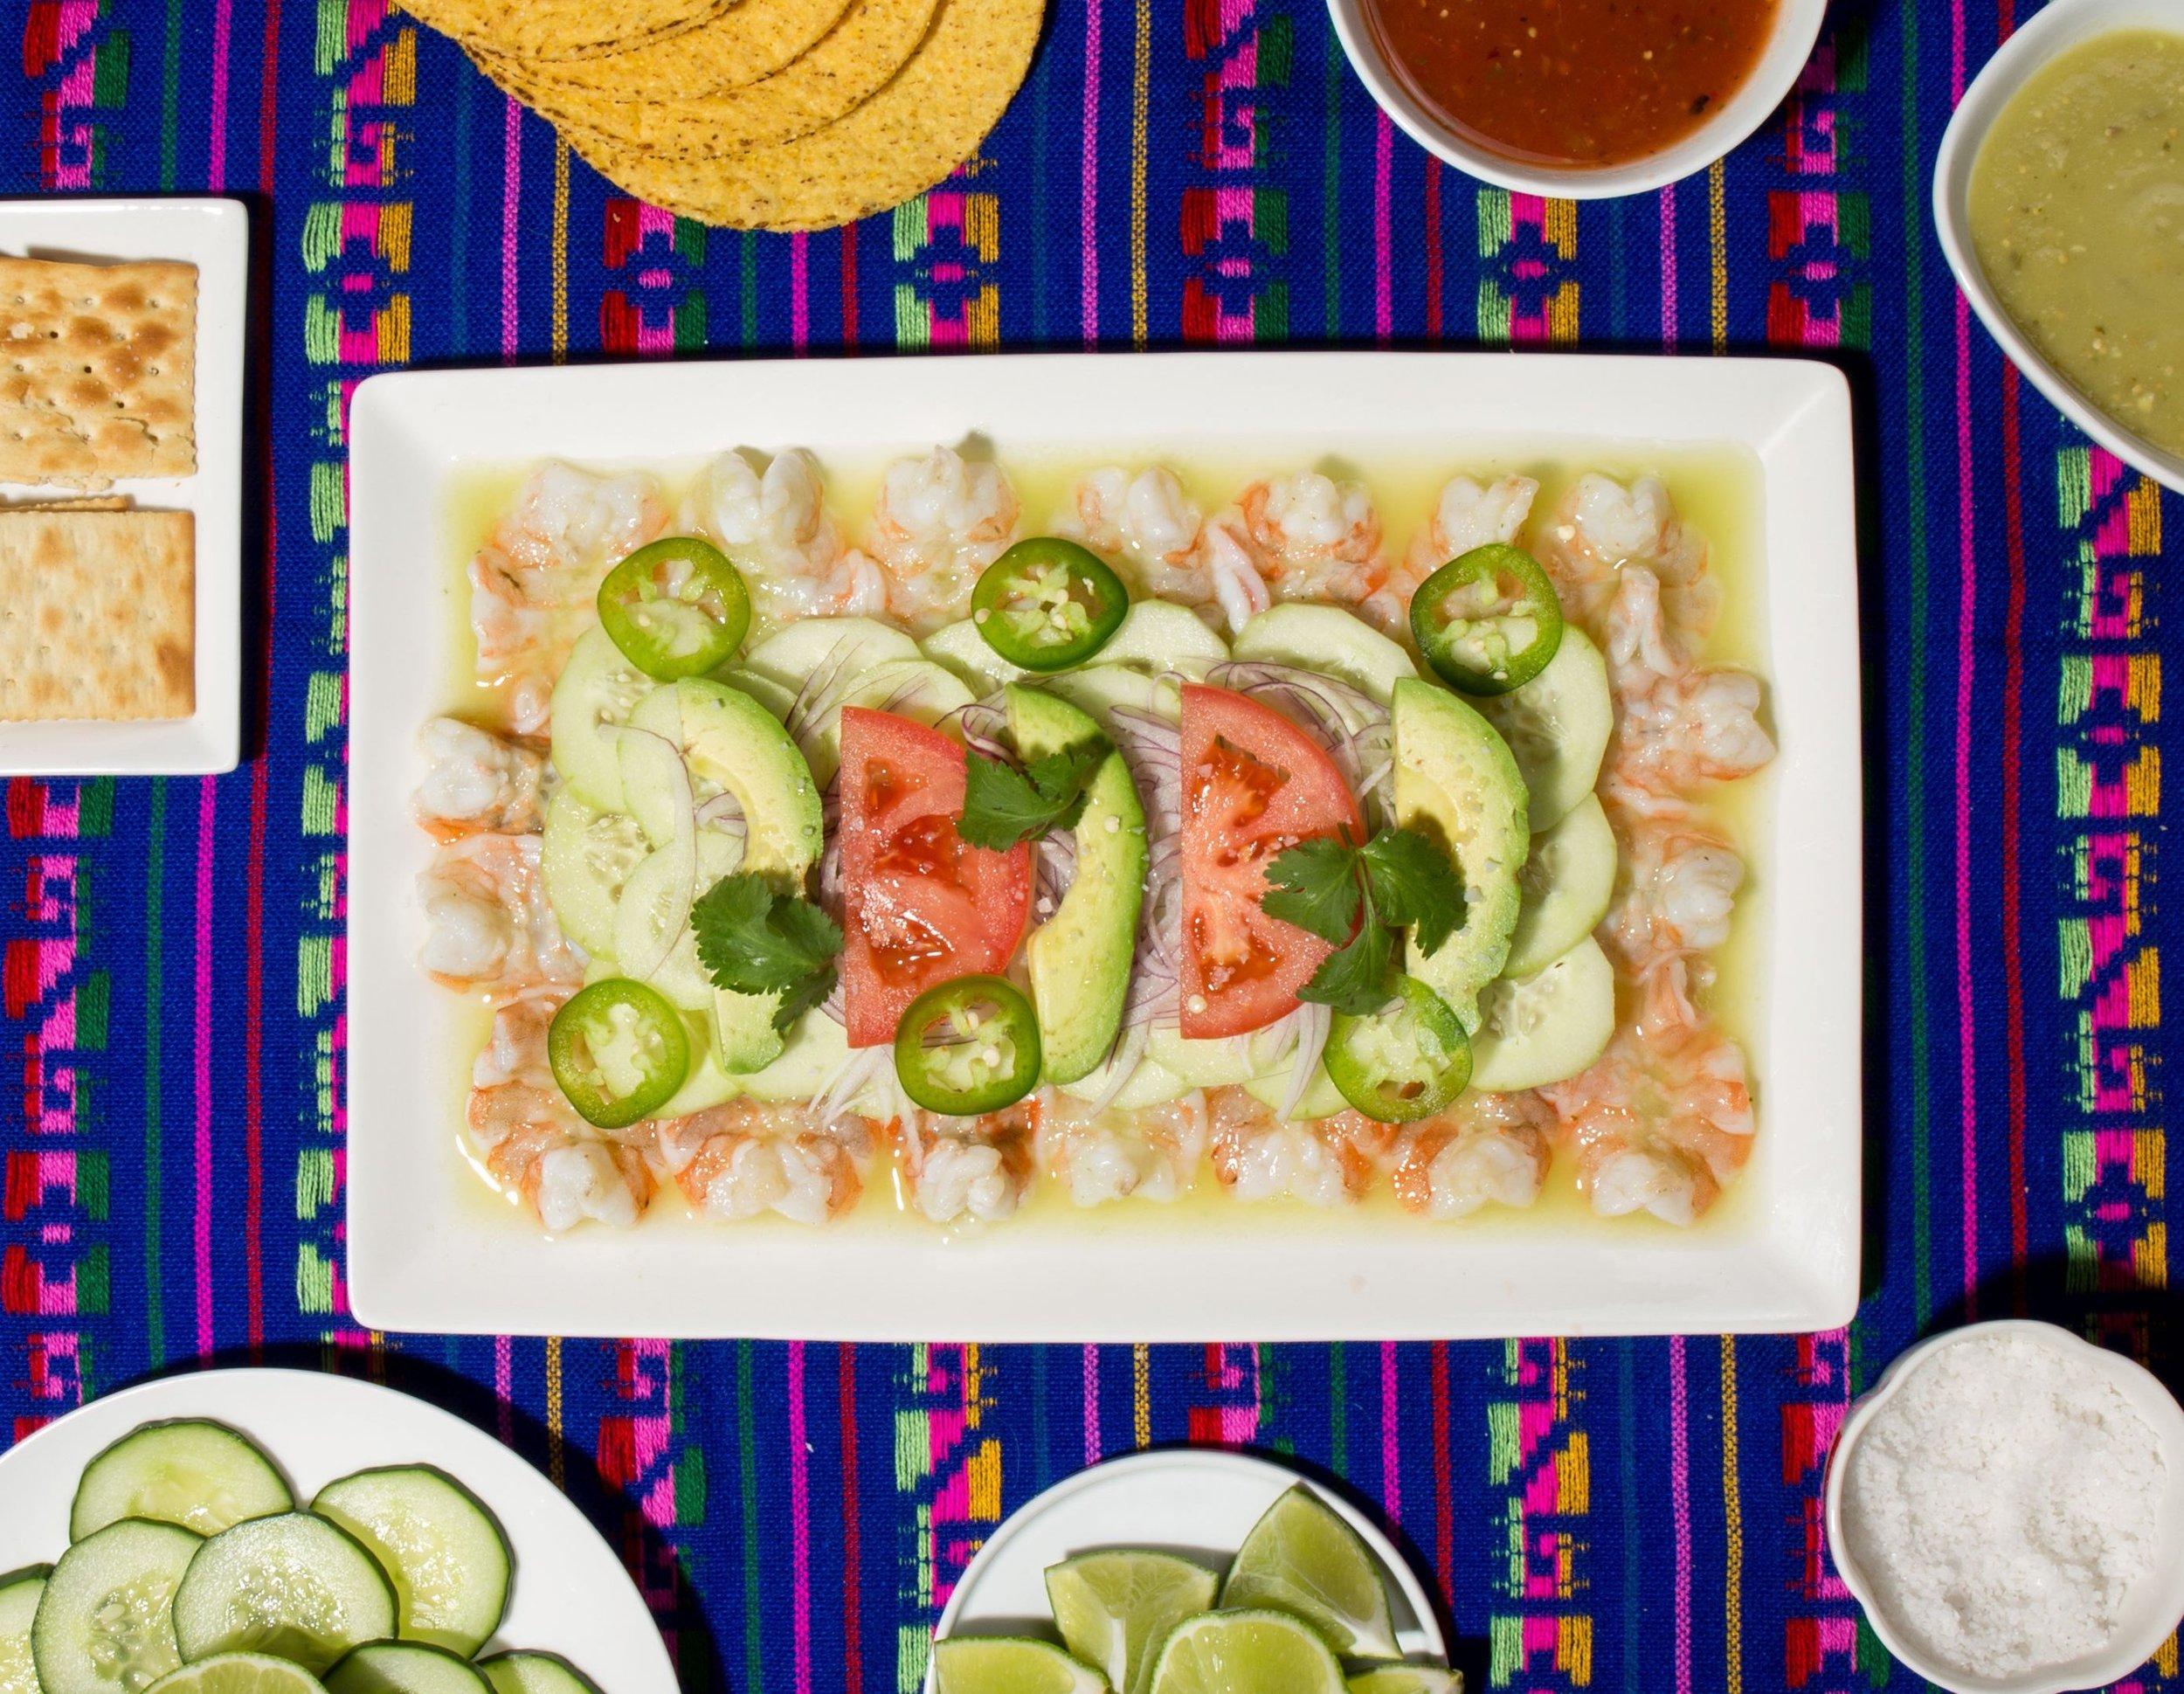 Image courtesy of Chicano Eats.